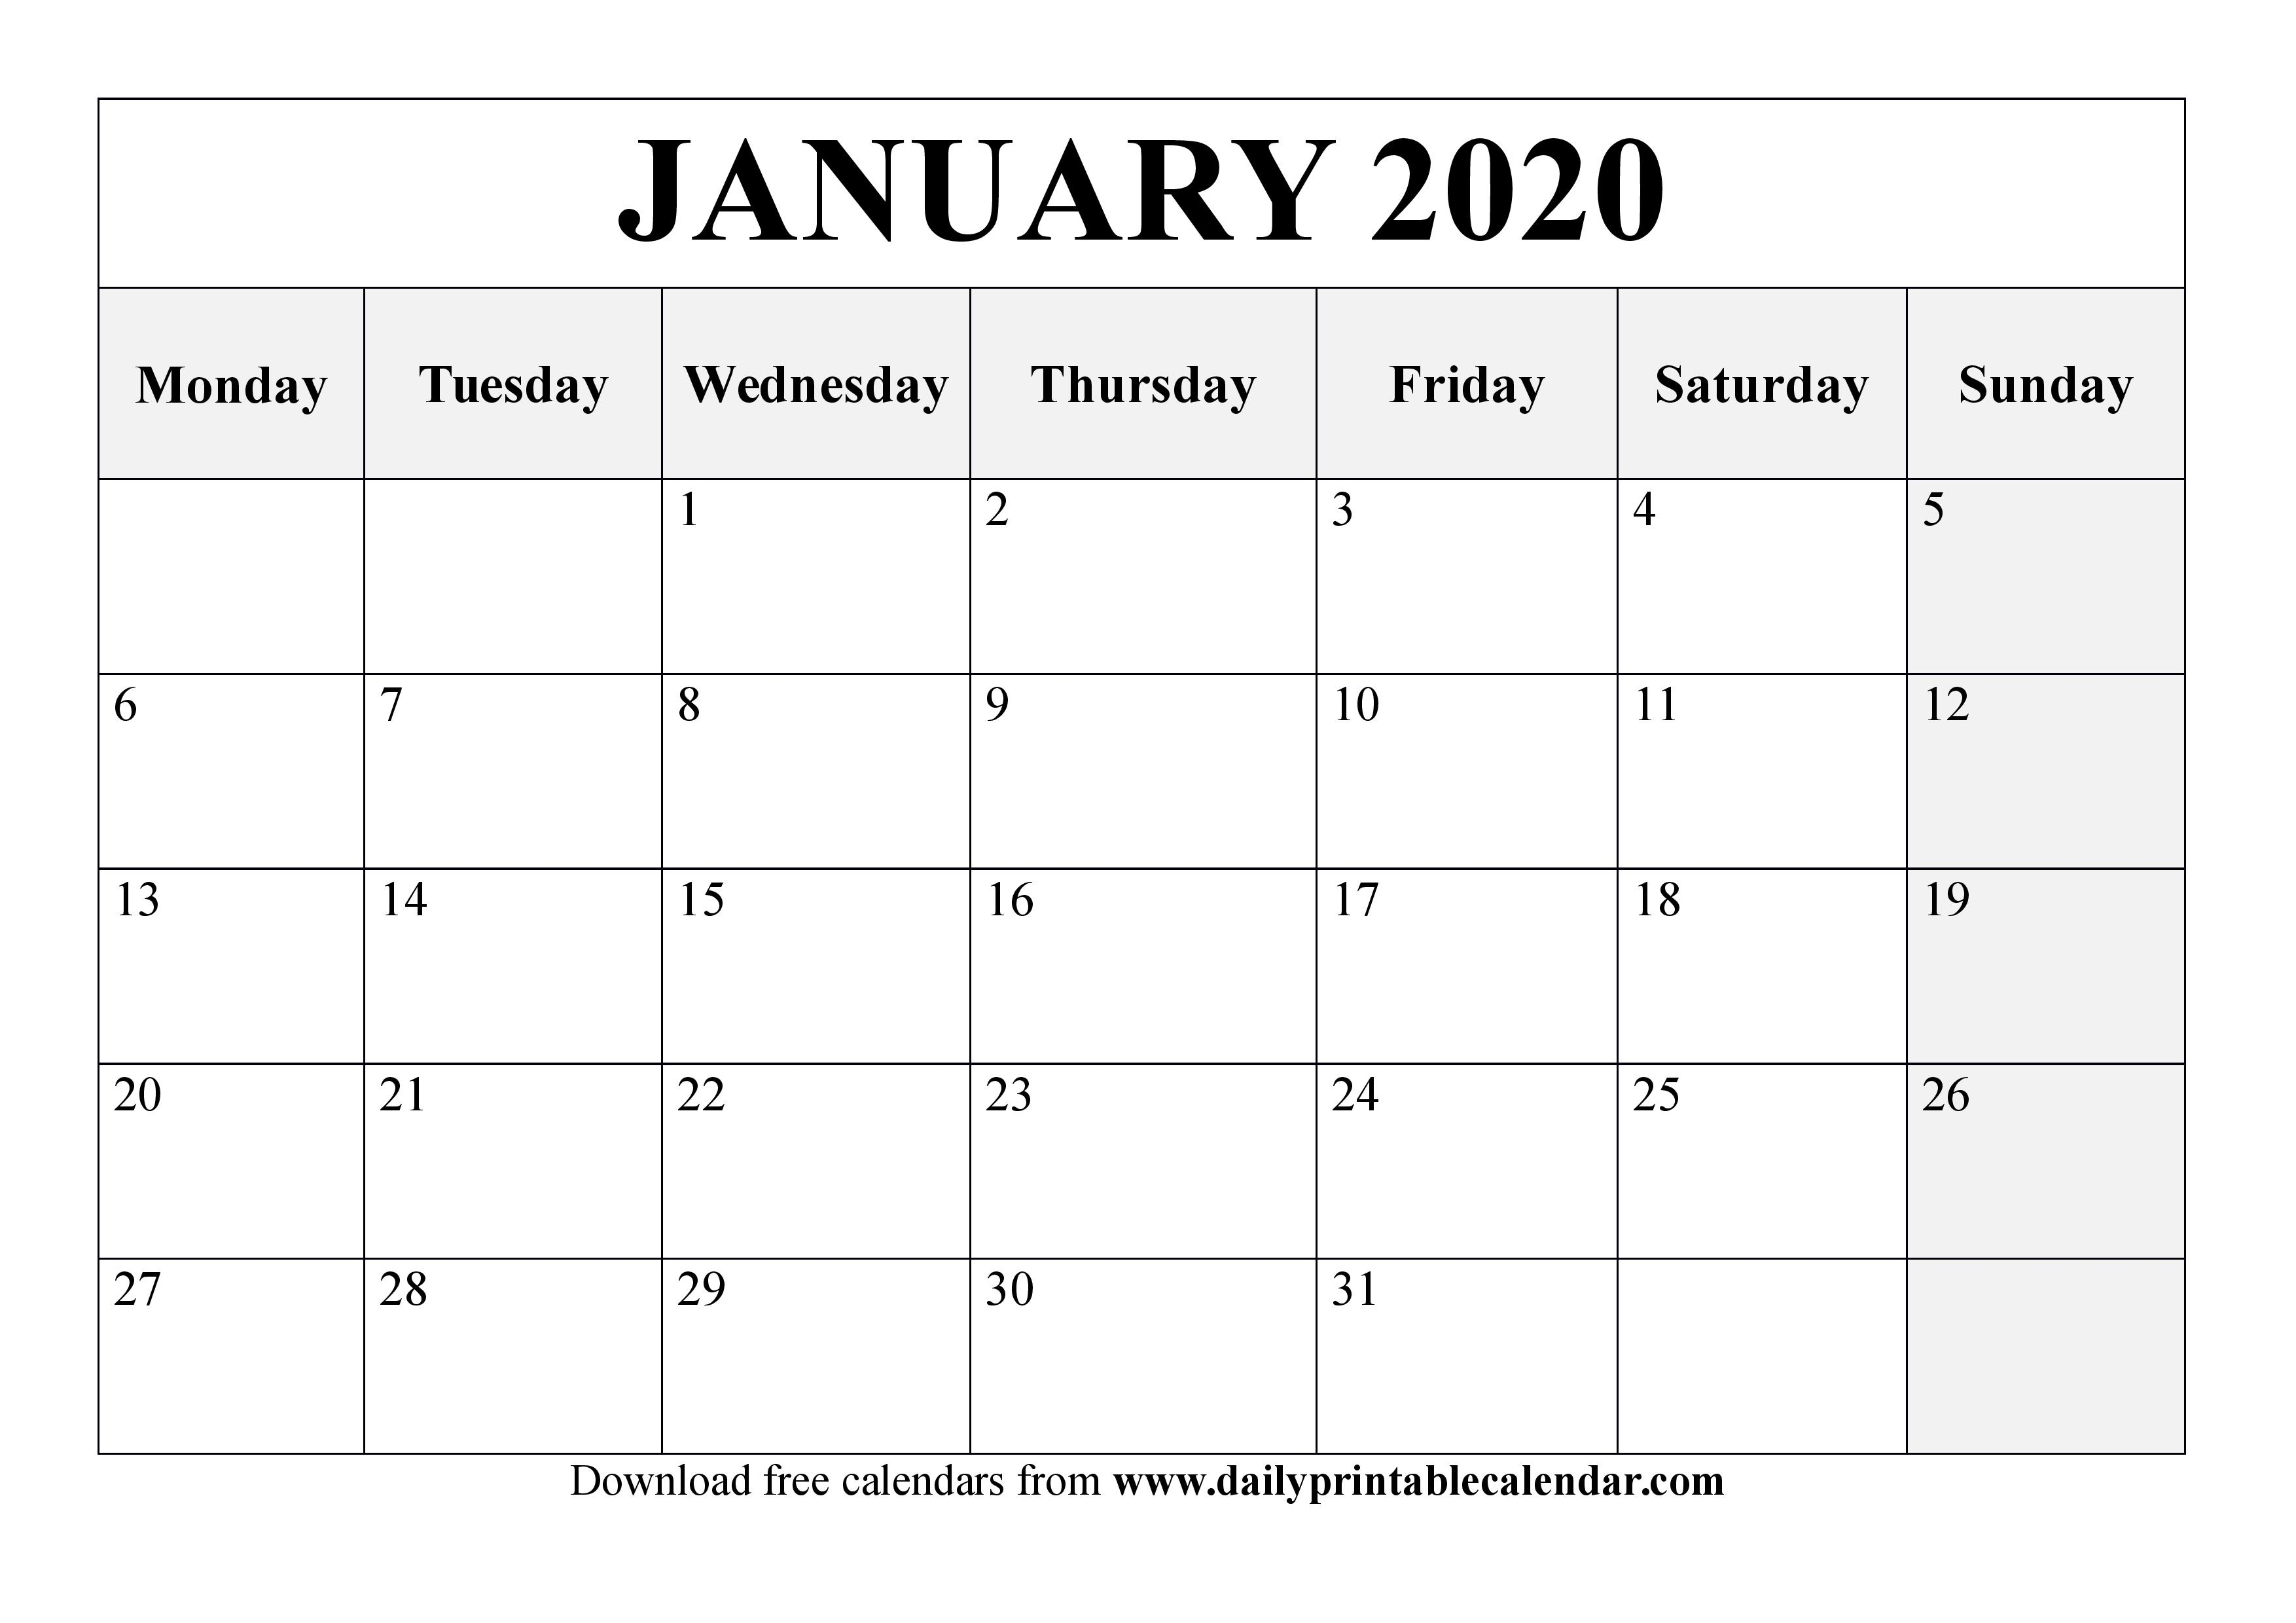 January 2020 Calendar Printable  Blank Templates  2020 within 2020 Calendar Template Monday Start